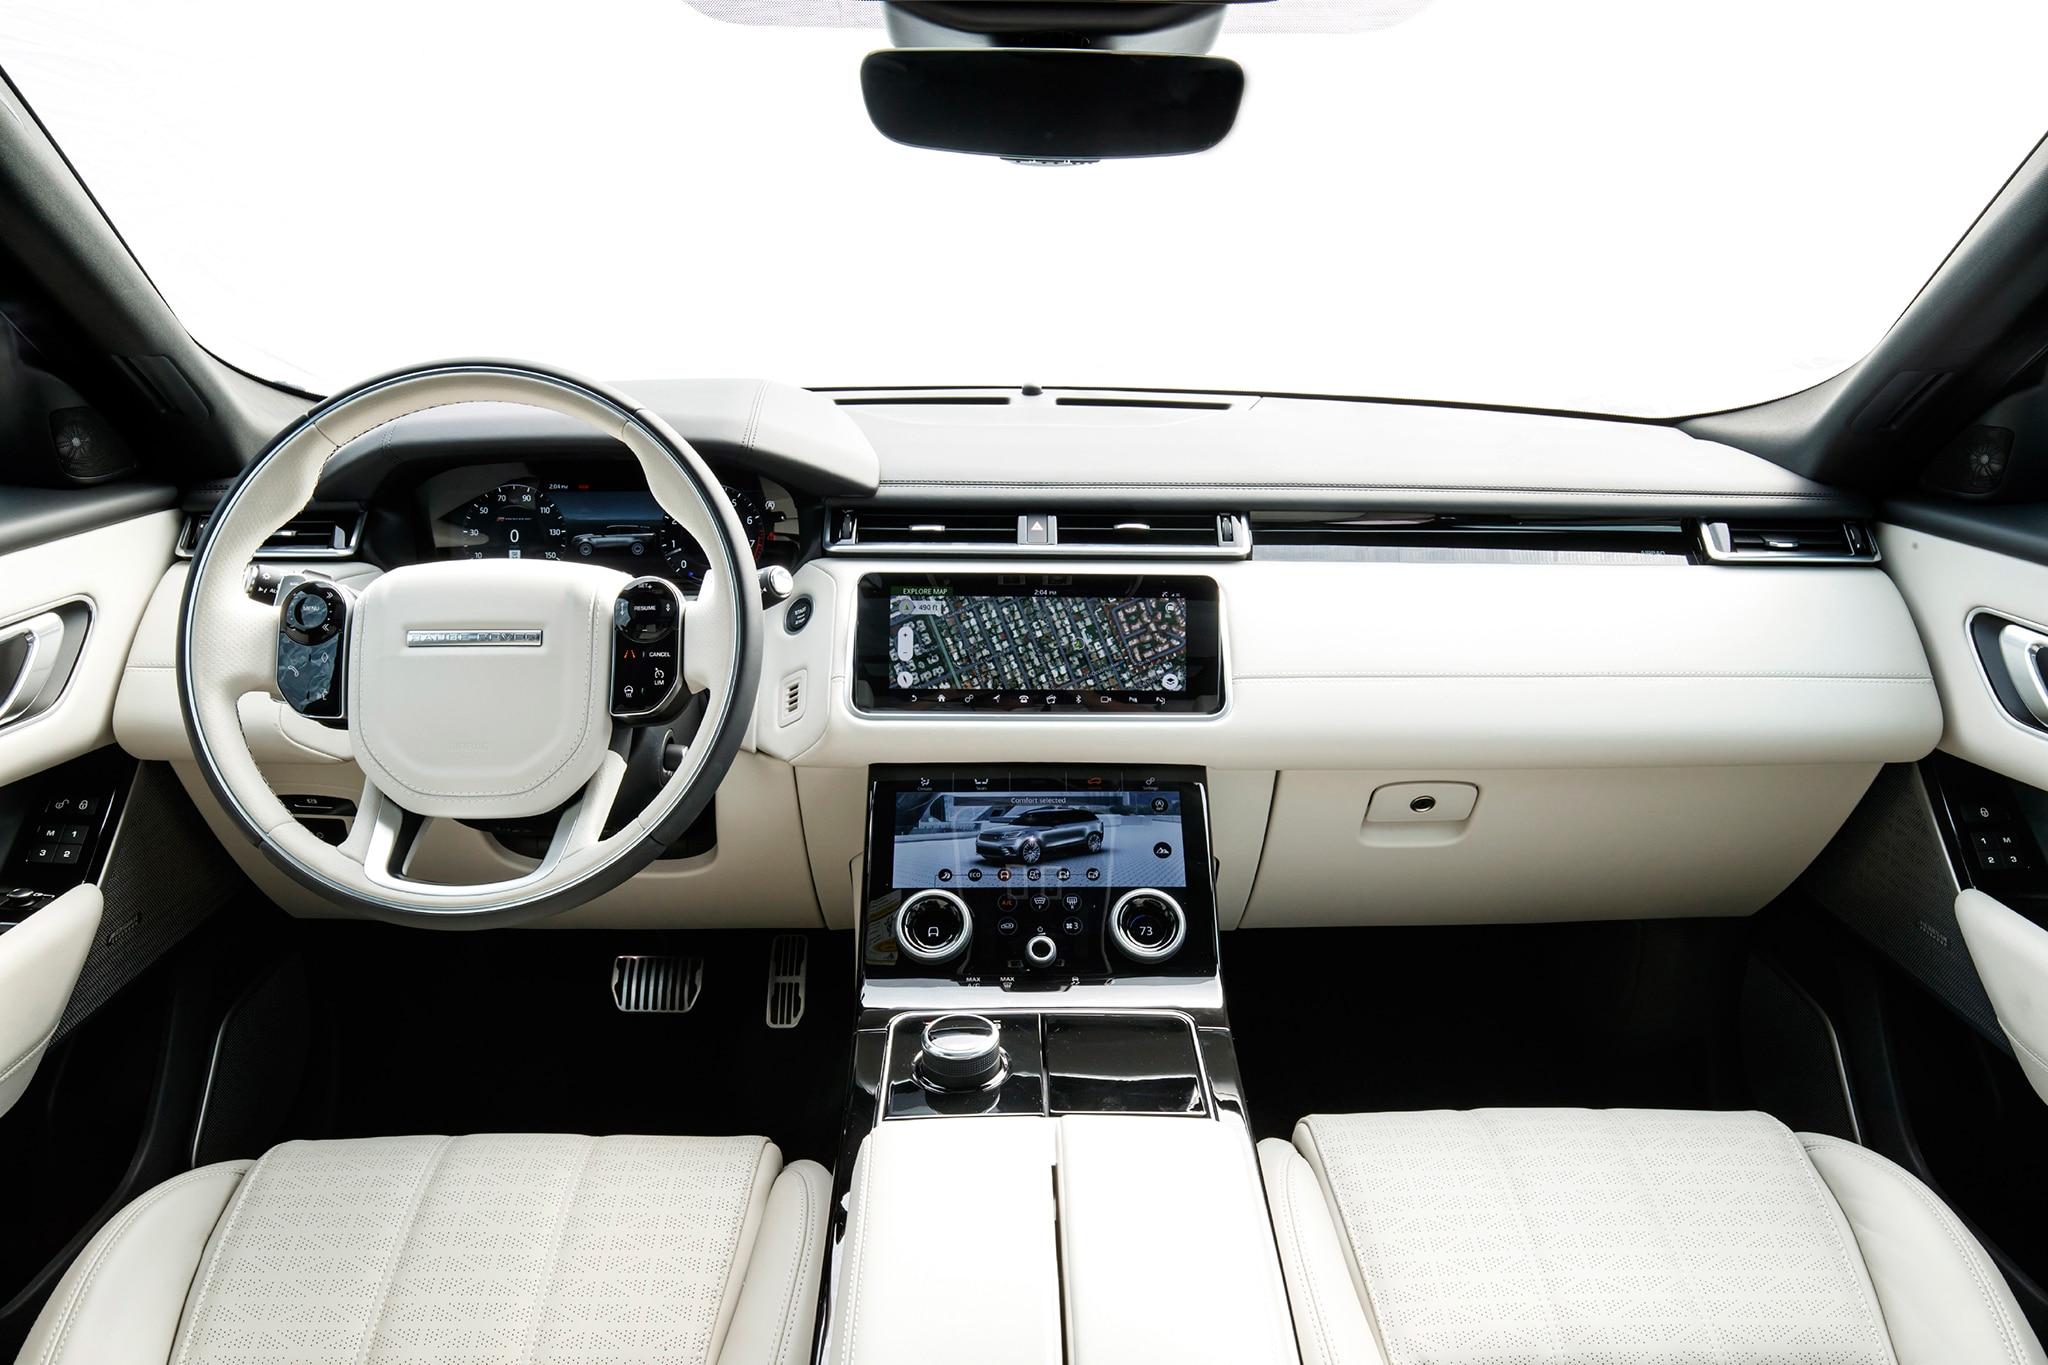 First Drive: 2018 Range Rover Velar U.S. Spec | Automobile ...